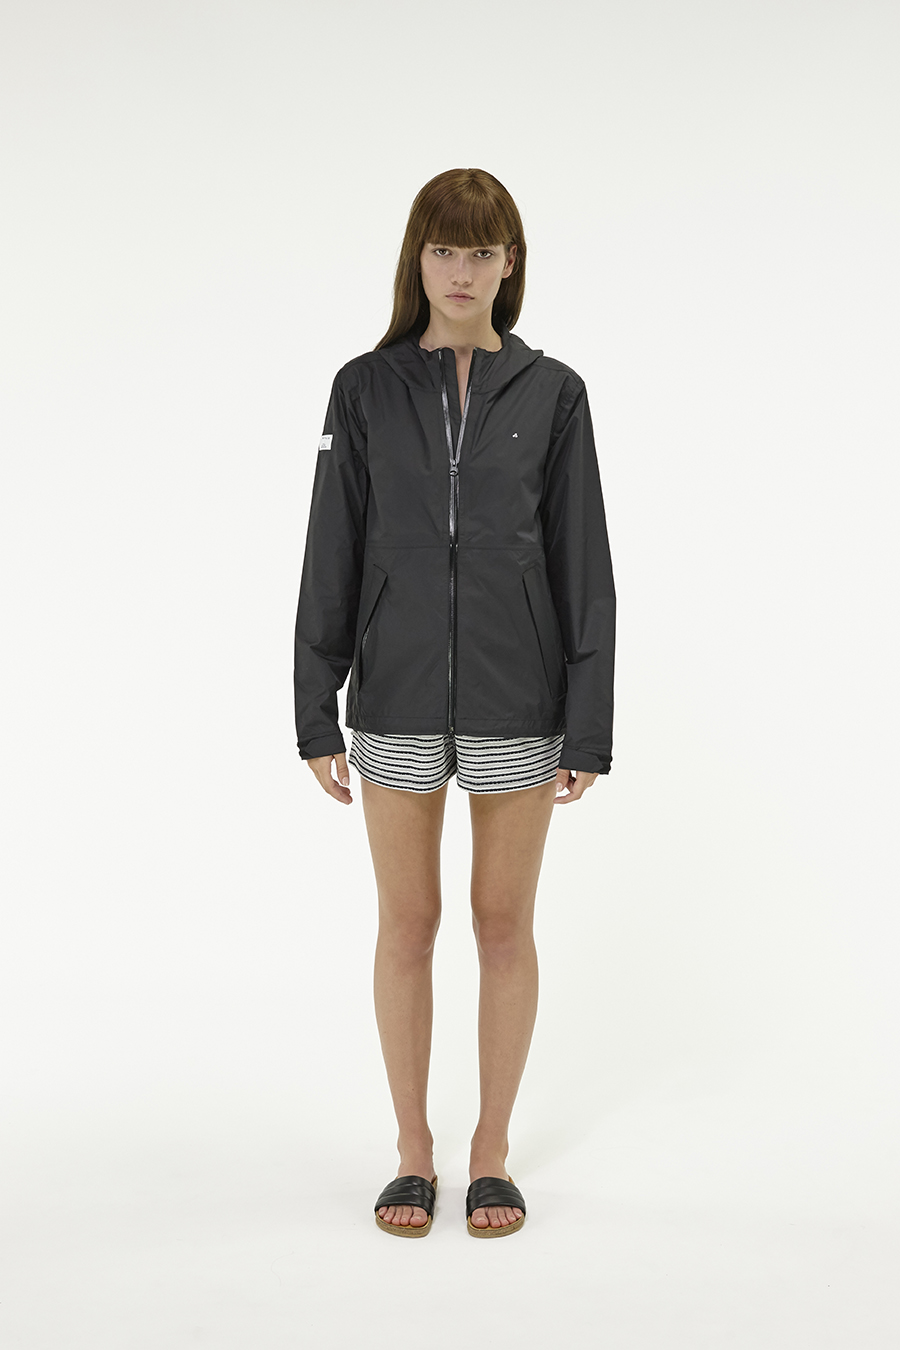 Huffer_Q3-16_W-Alpine-Jacket_Black-01